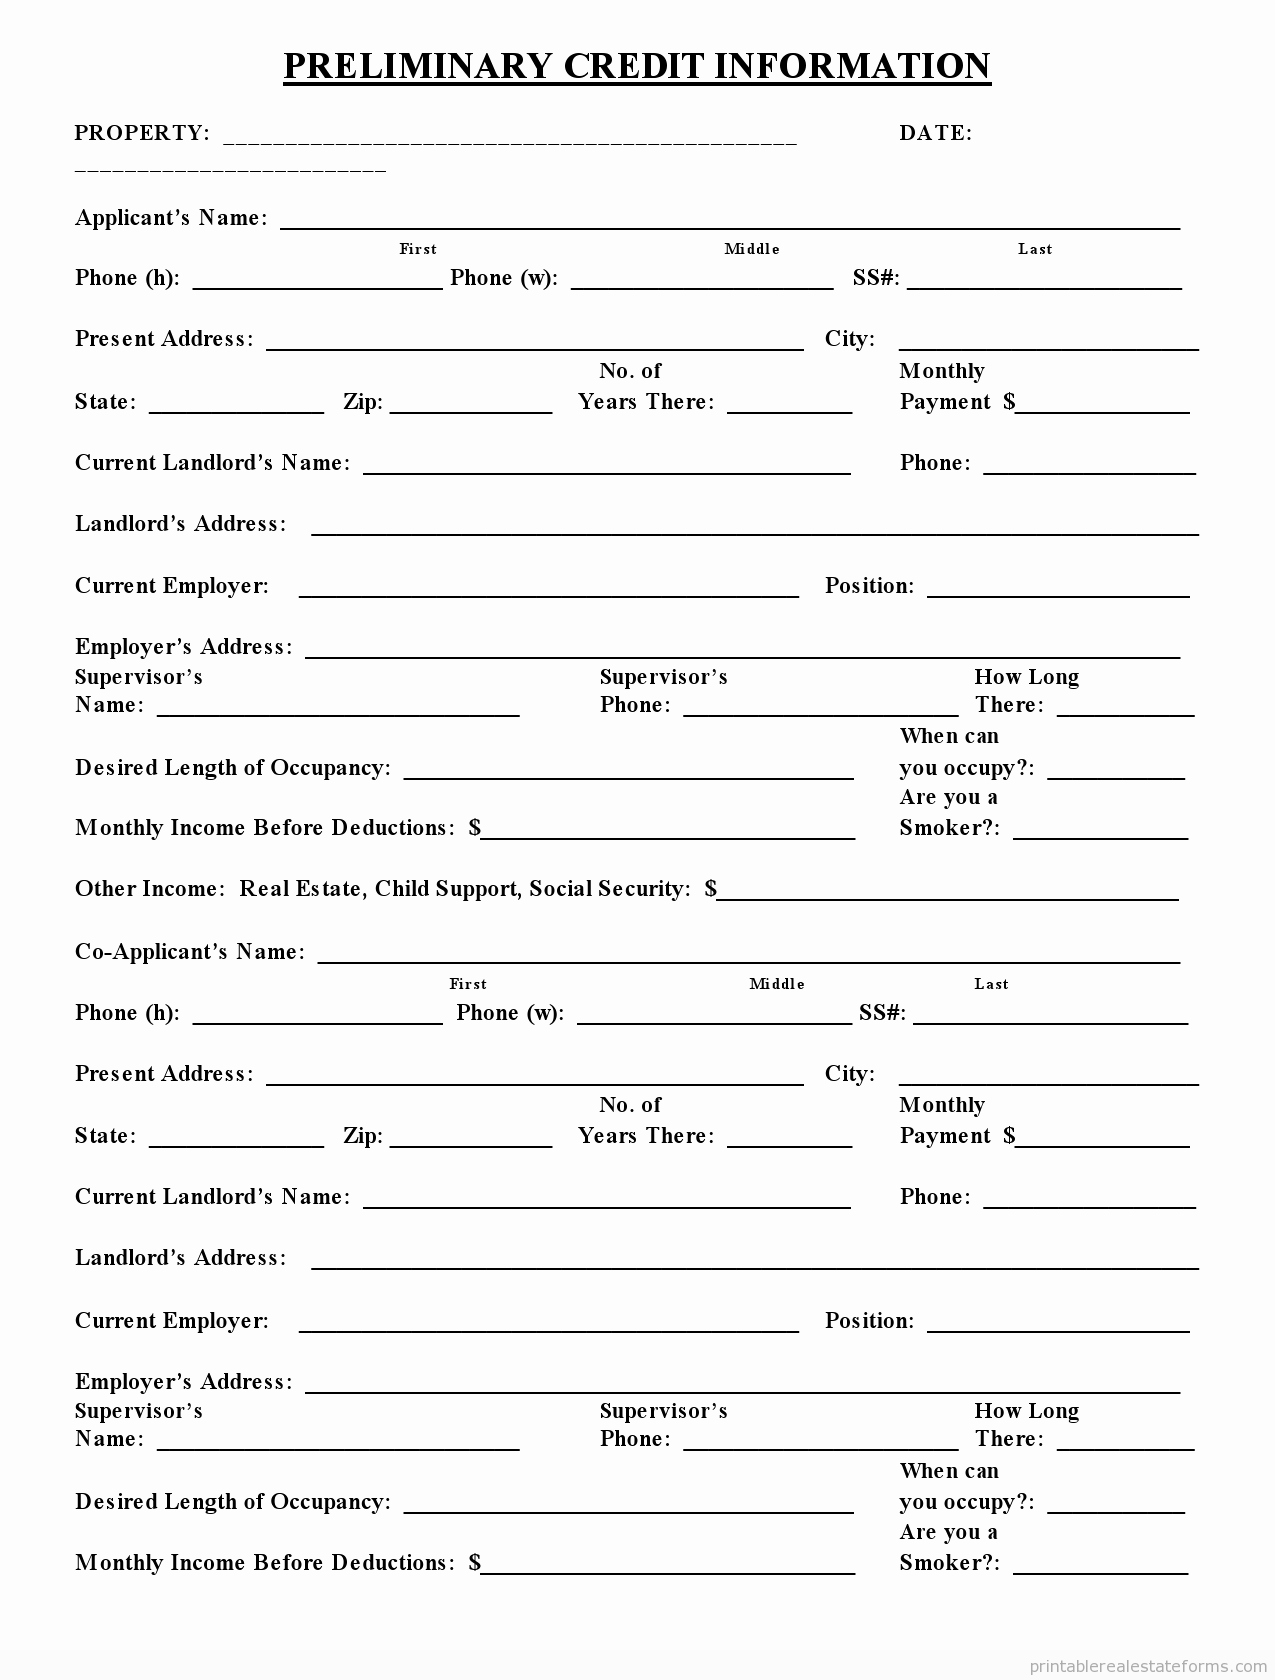 Sample Of Credit Application form Unique Sample Printable Preliminary Credit Application form